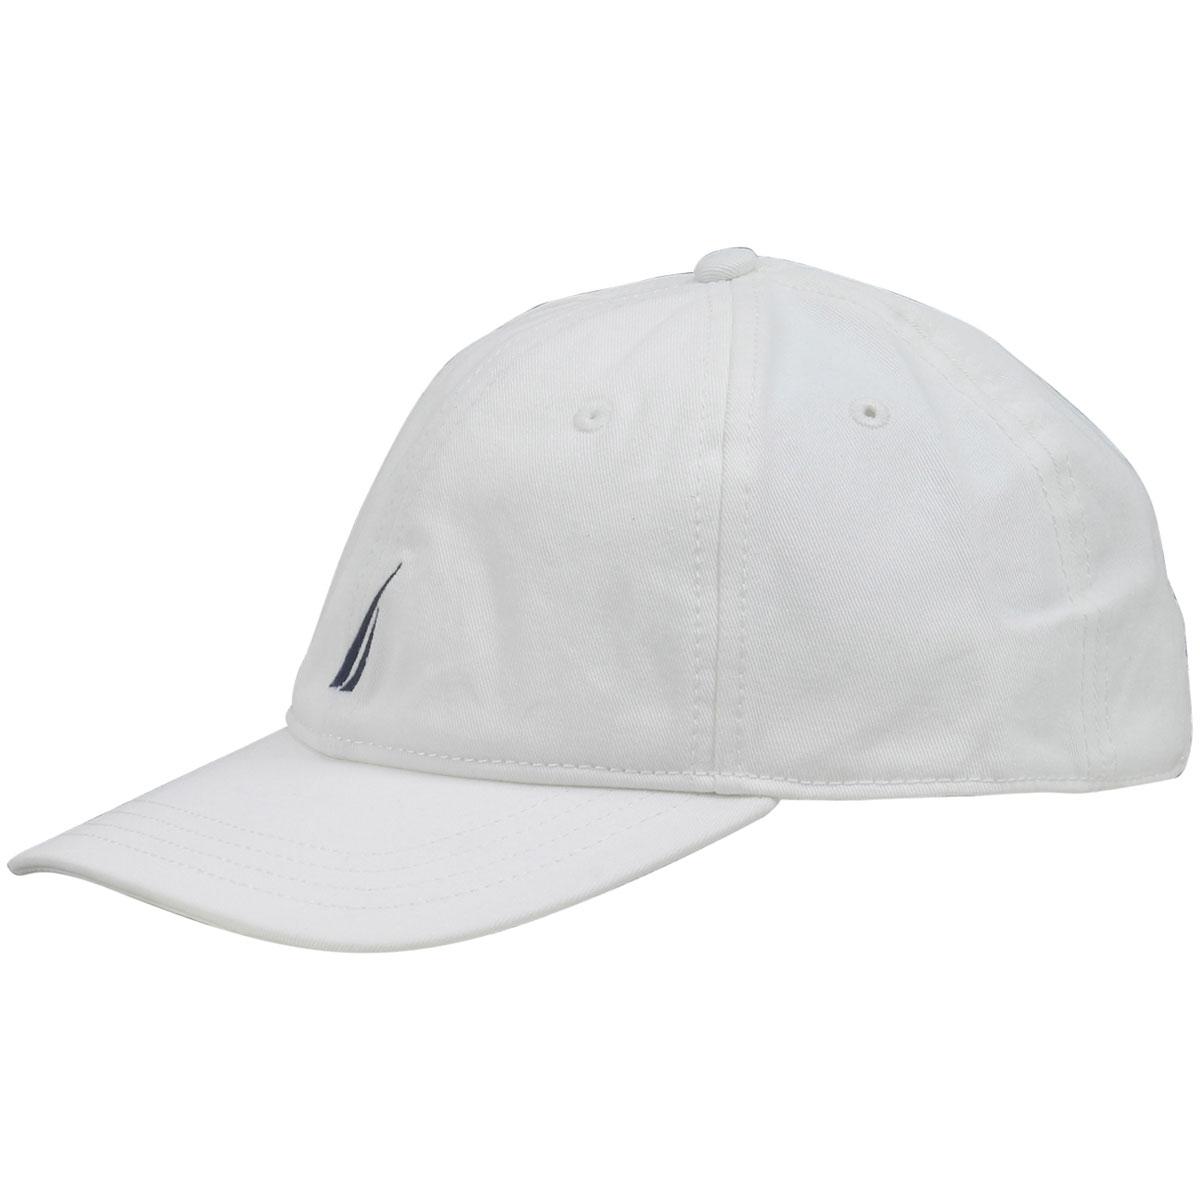 5296813cd23f7 Nautica Anchor J-Class White Cotton Cap Baseball Hat (One Size Fits ...